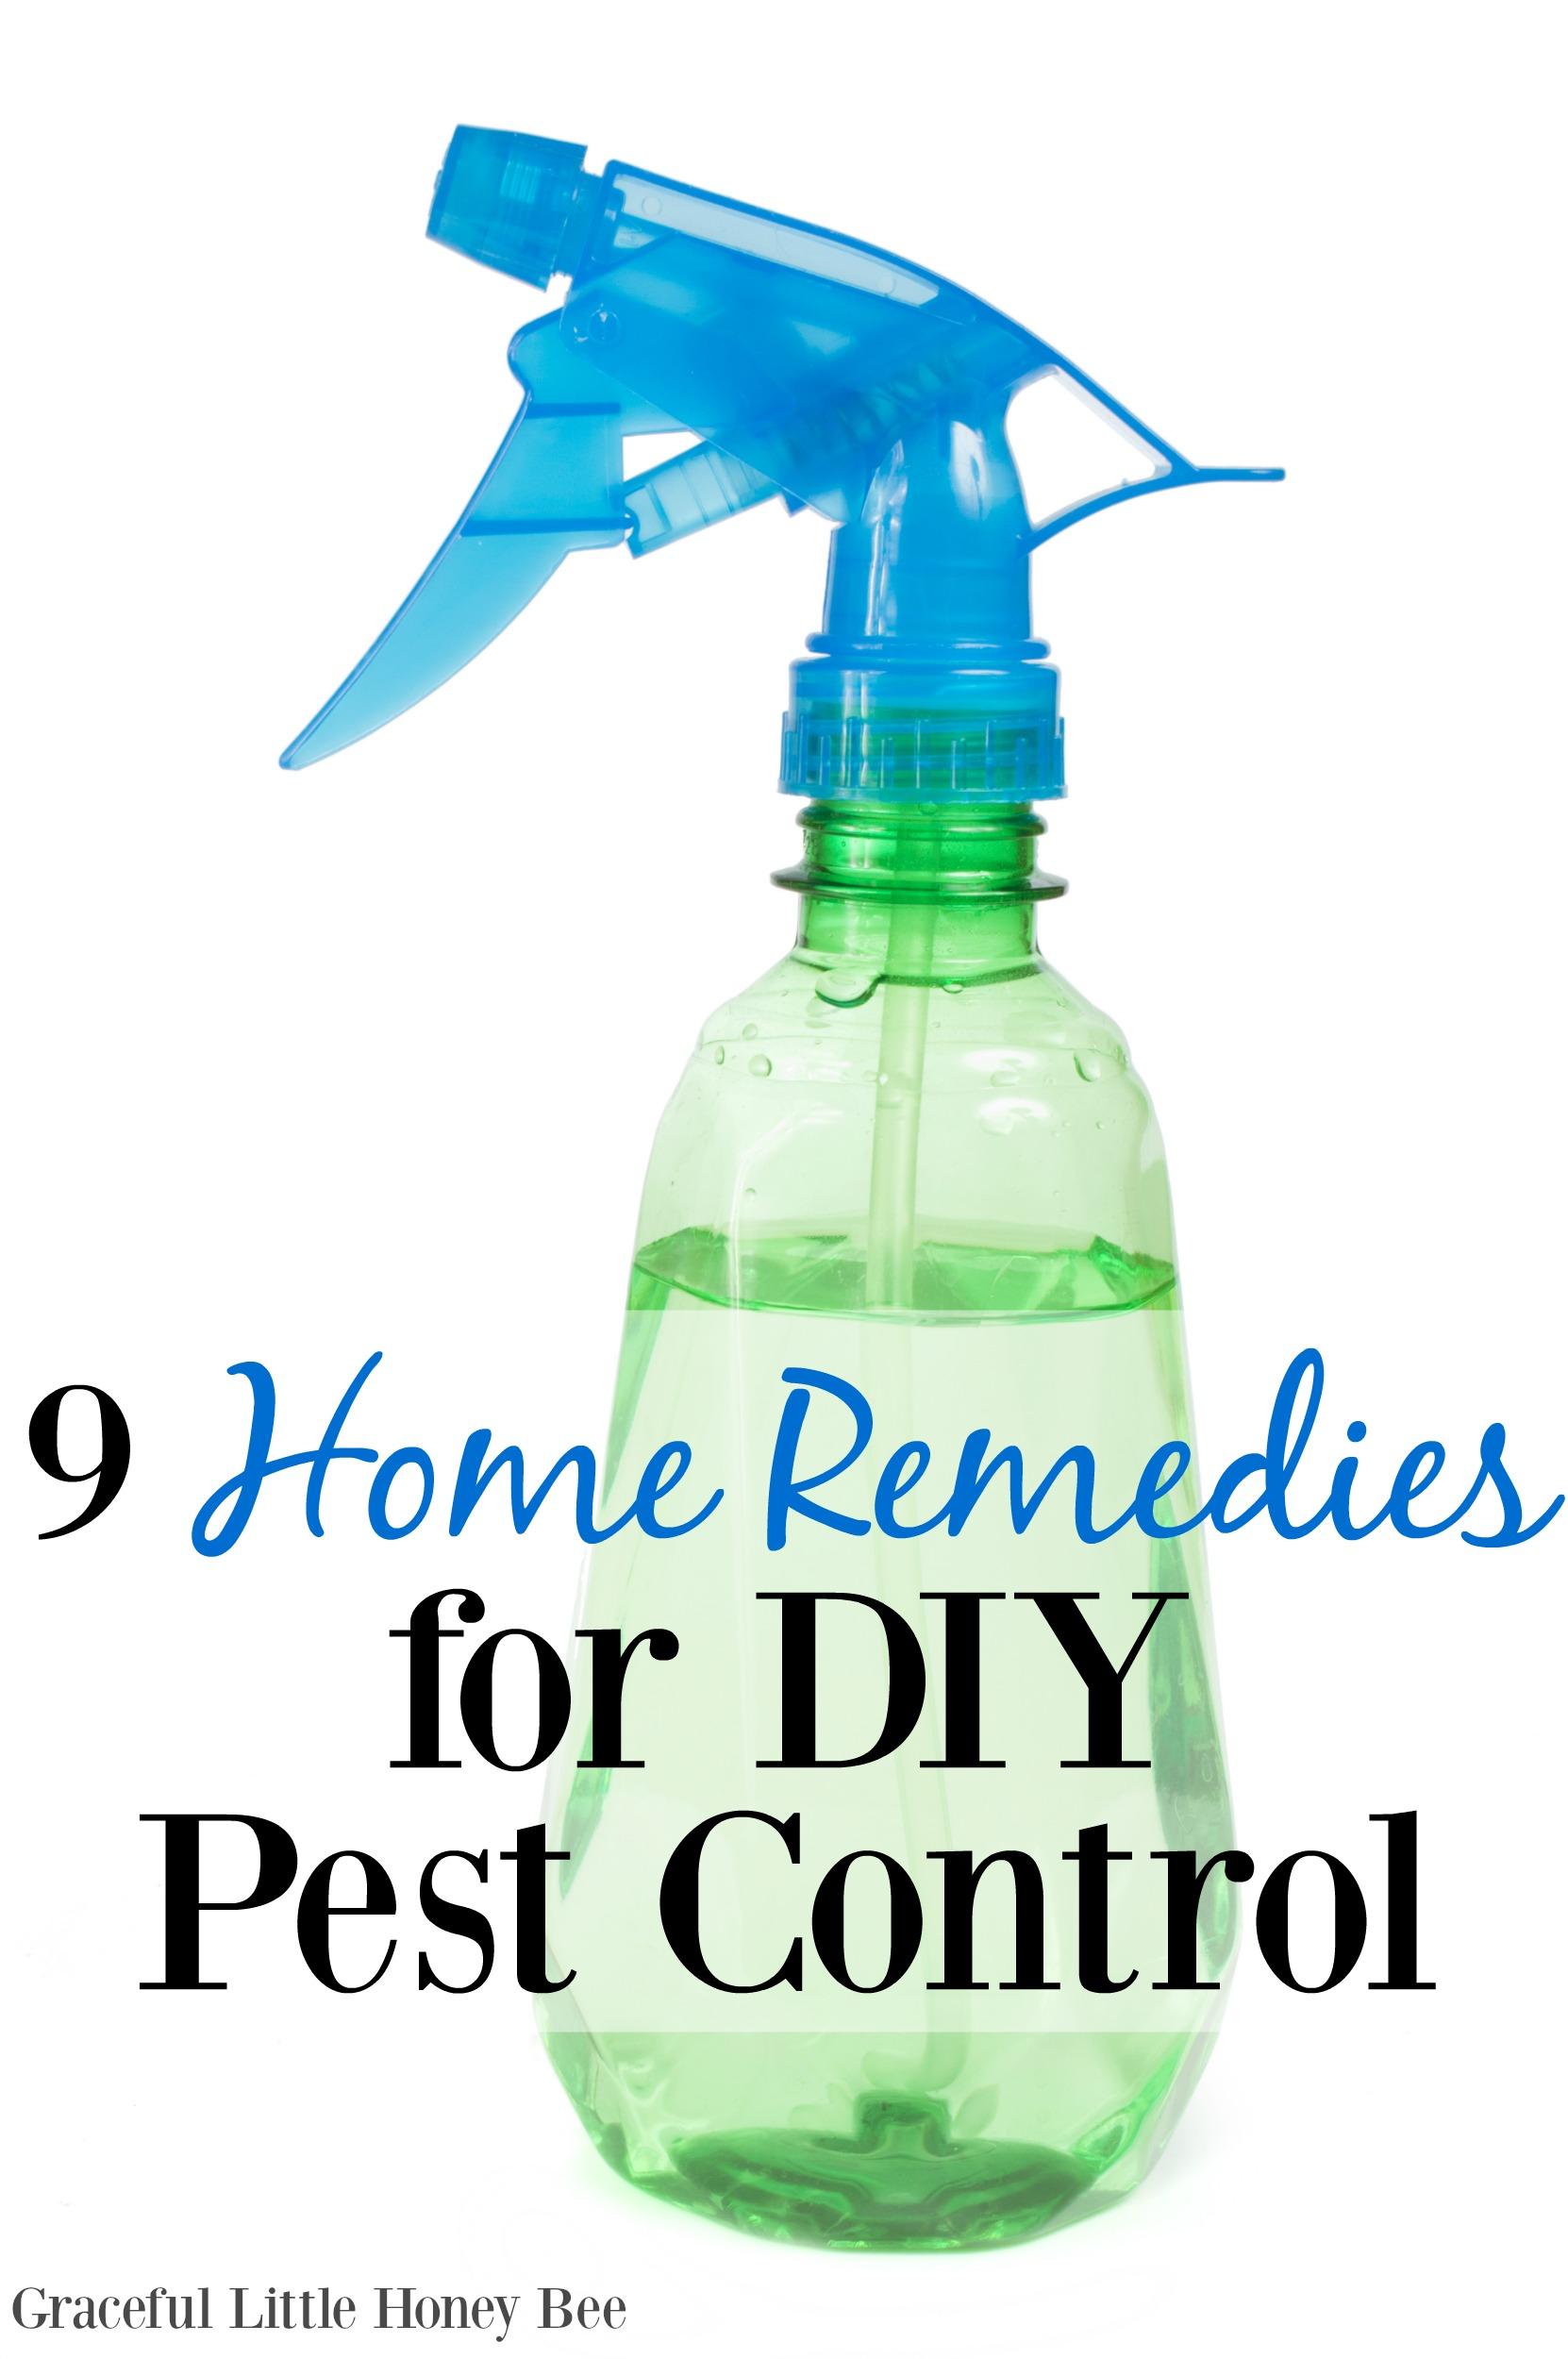 Home pest control home pest control how to home pest control how to images solutioingenieria Images